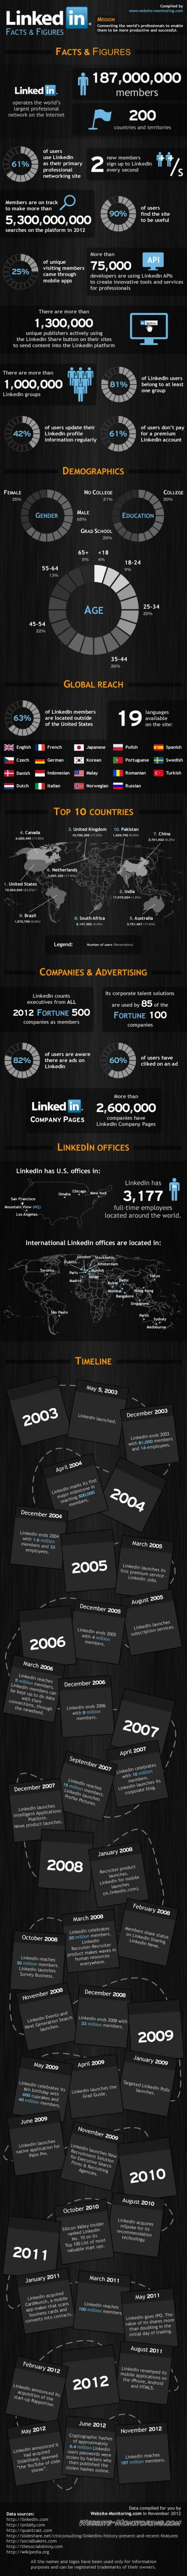 LinkedIn Facts and Figures [INFOGRAPHIC]   Talent Communities   Scoop.it